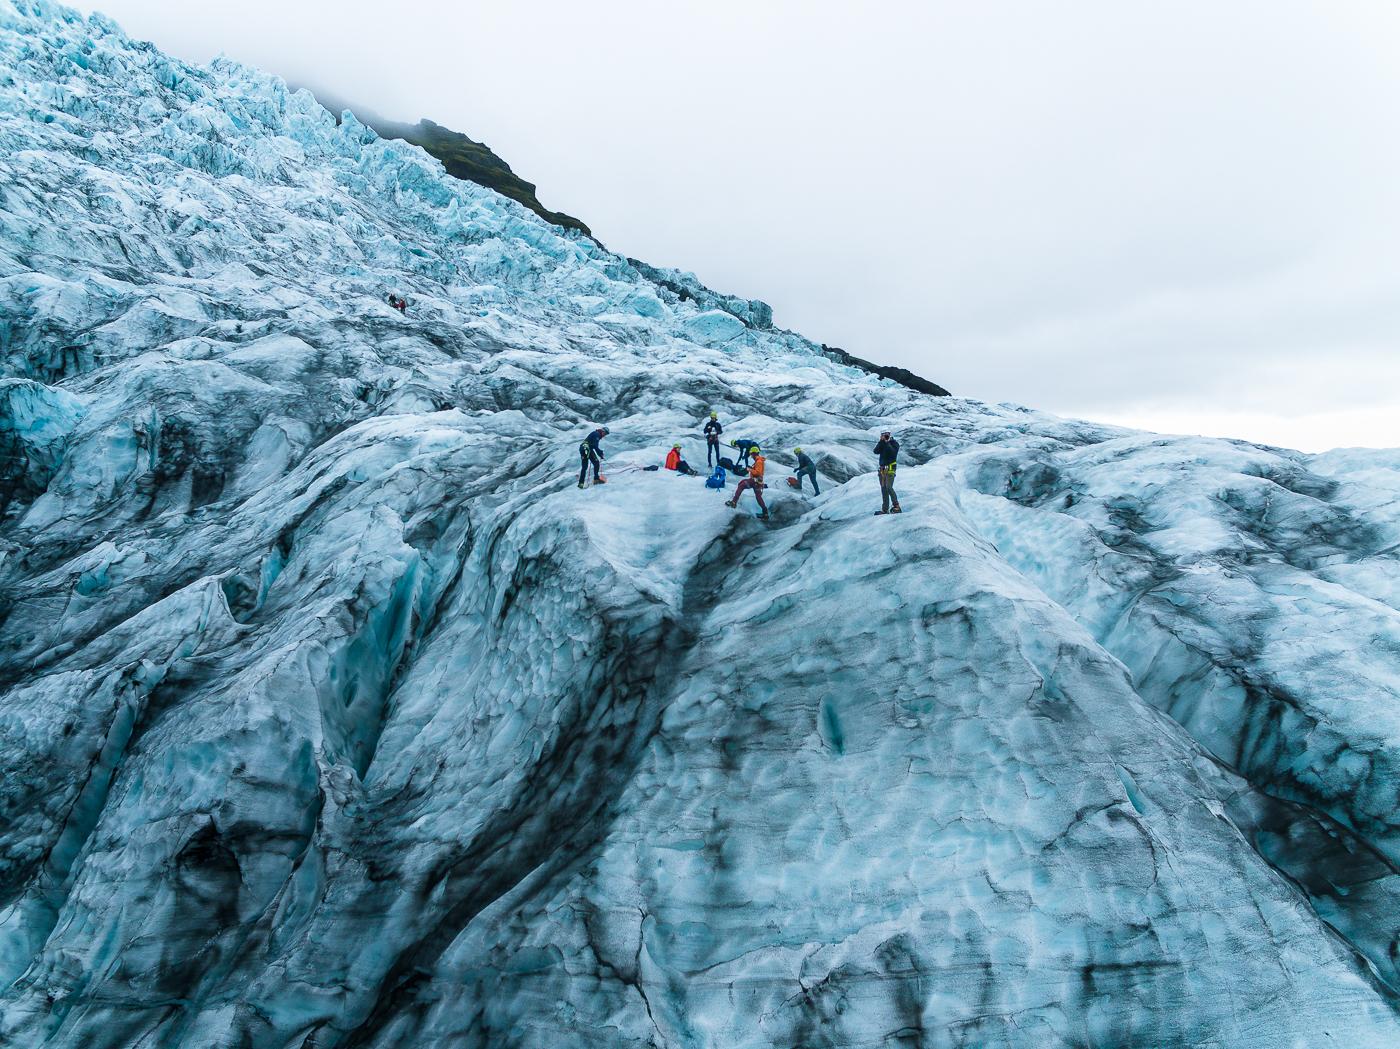 gabornagy_photography_iceland_glacier6.jpg